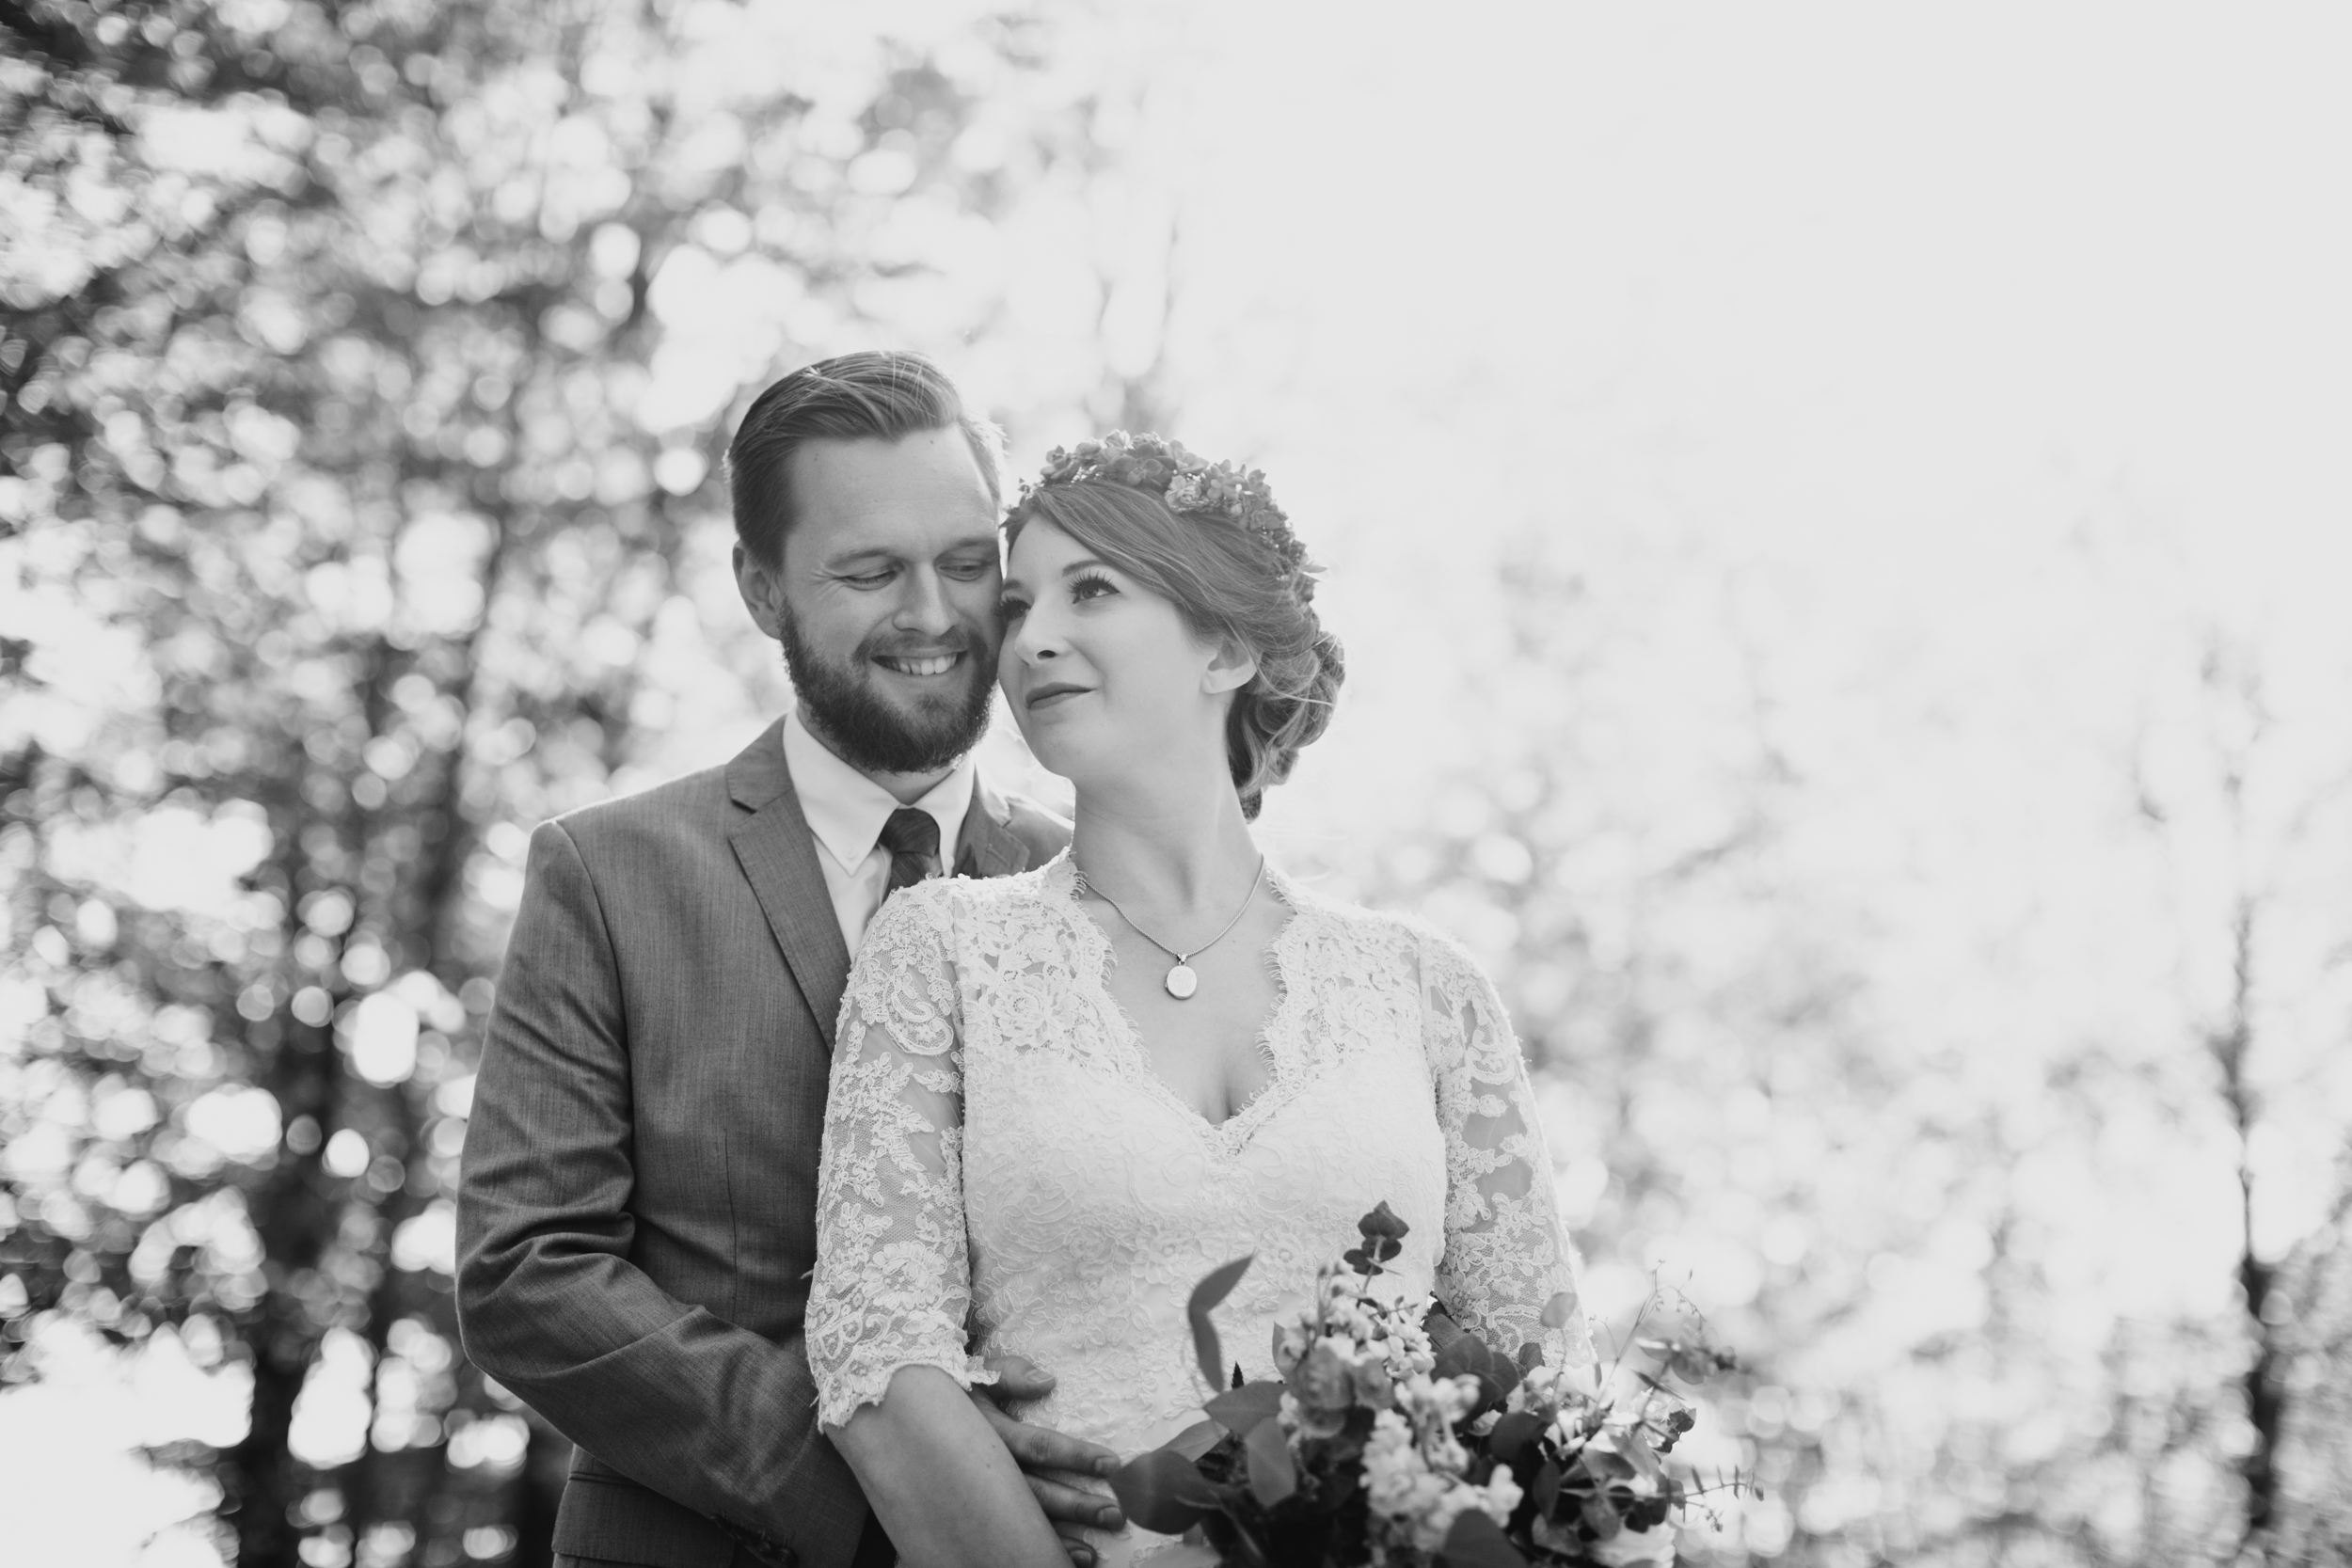 Spring-Meadows-Maine-Wedding-147.jpg